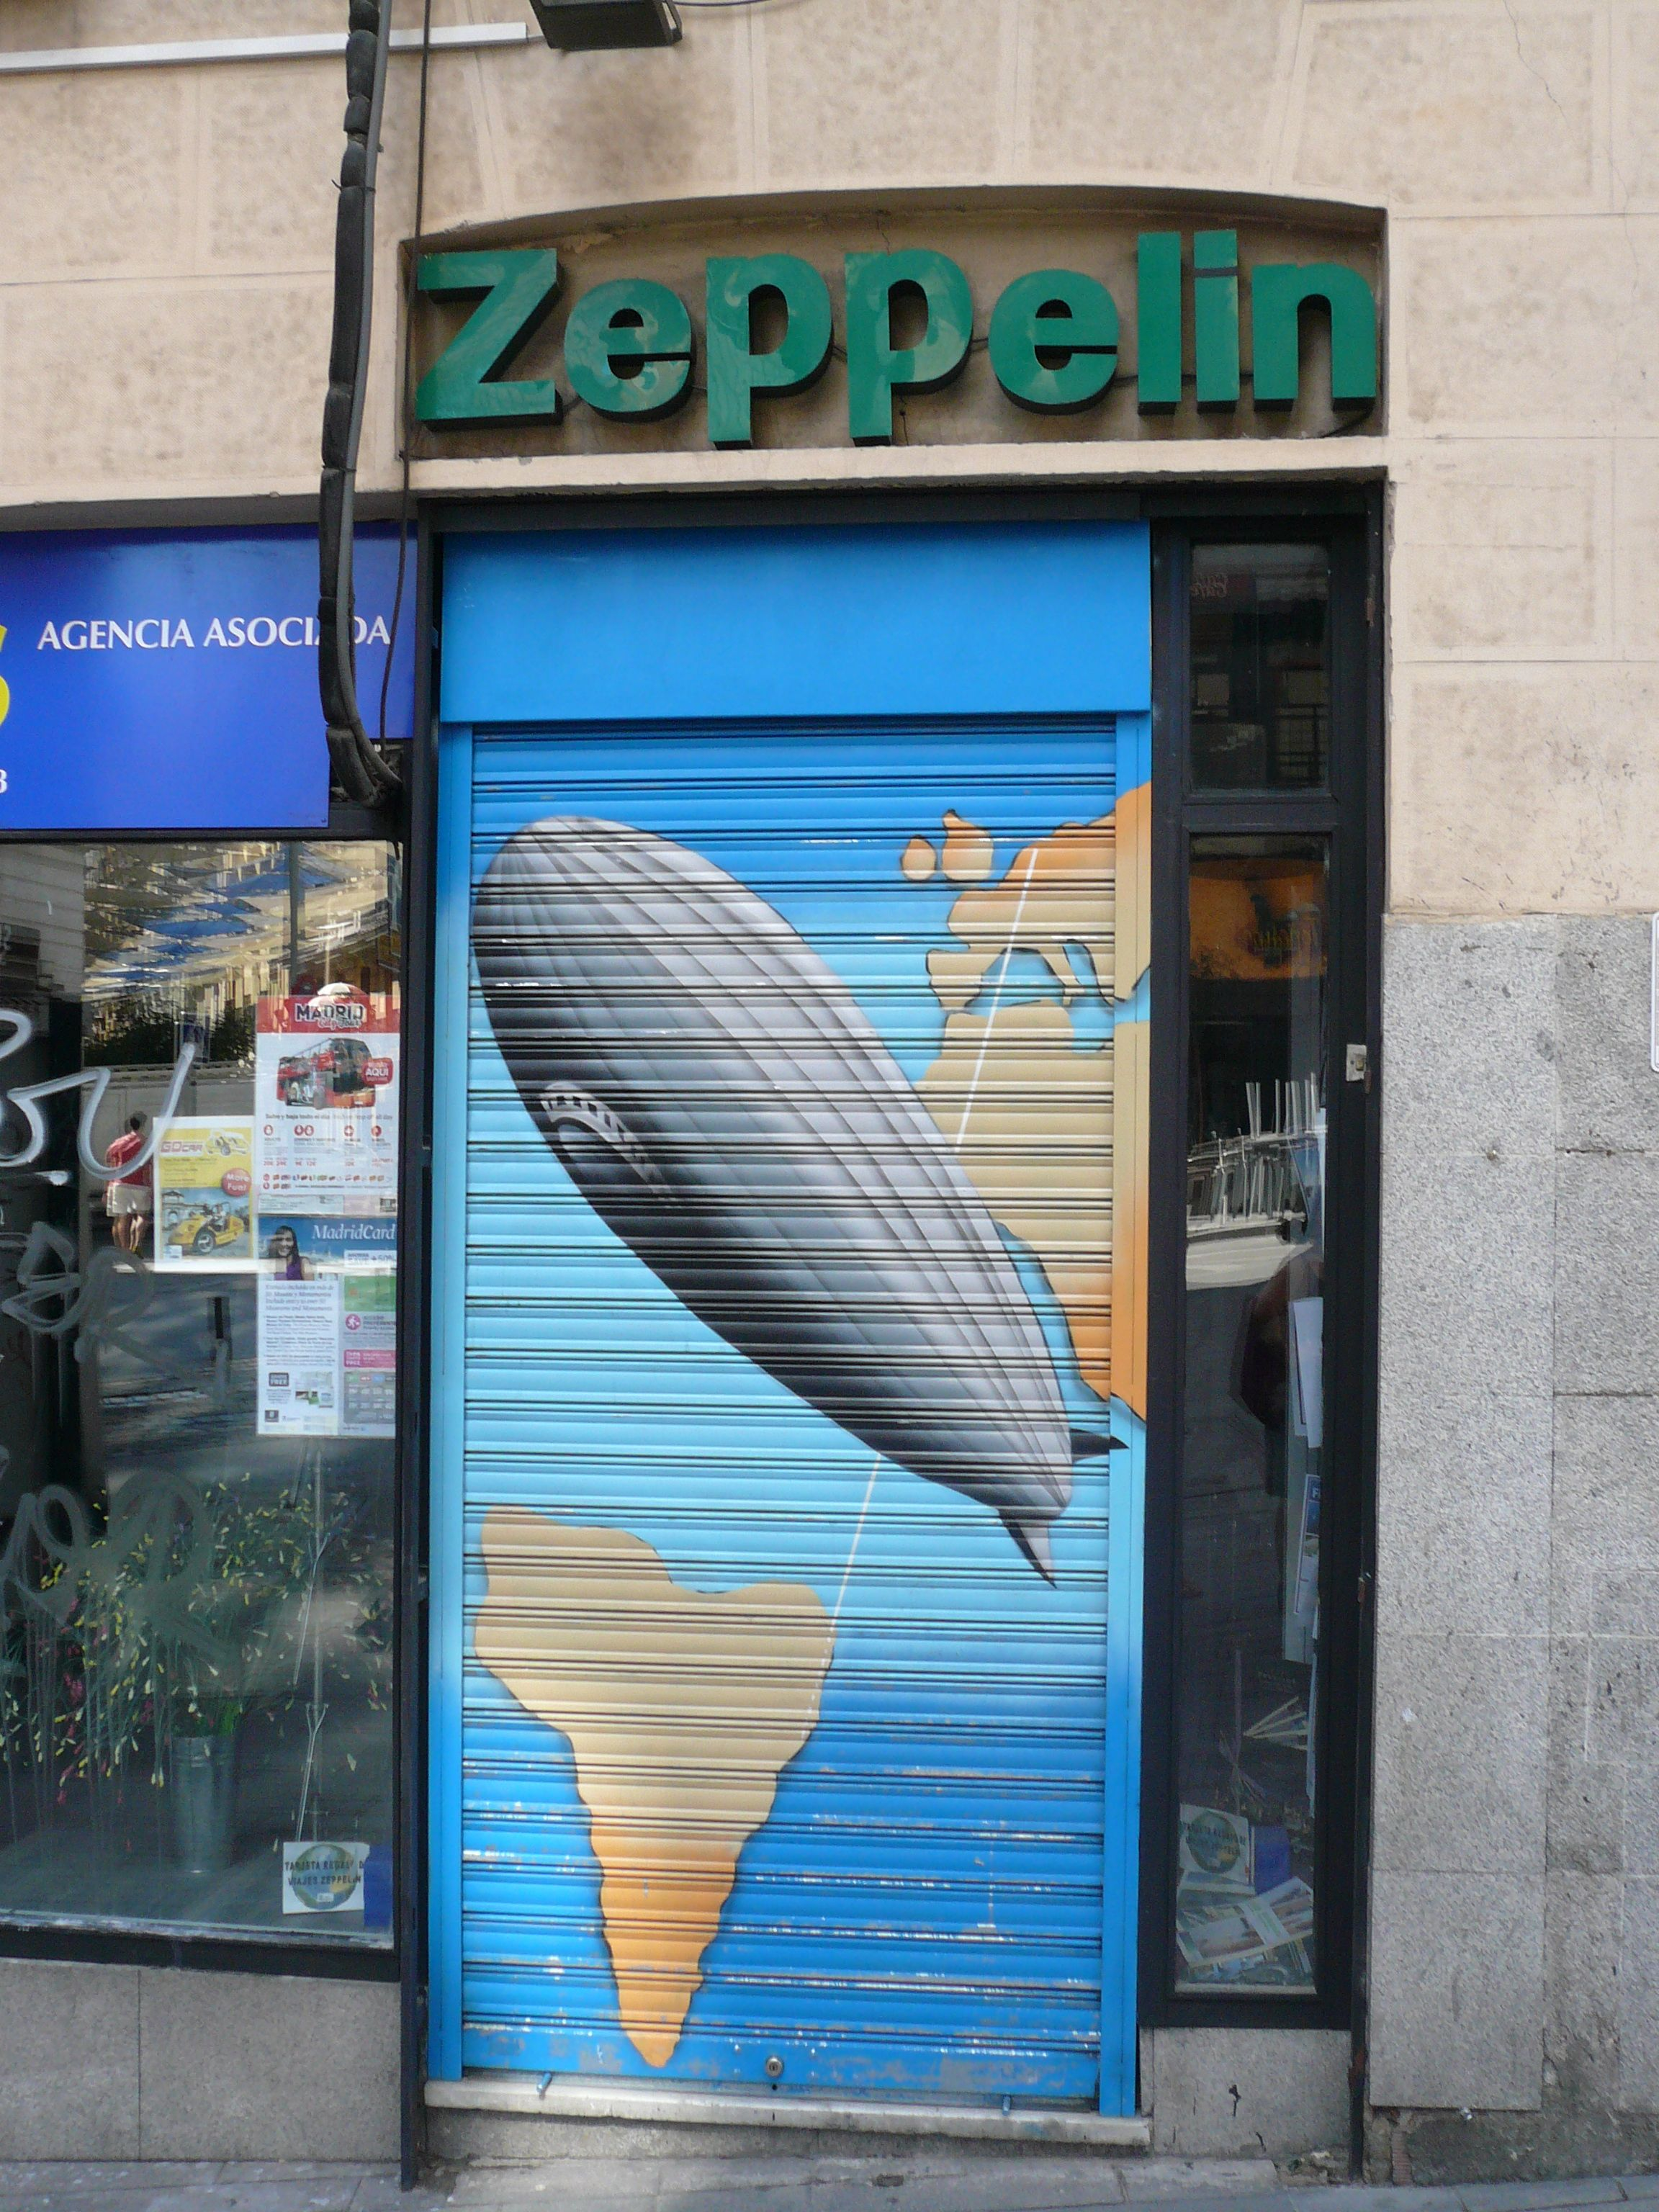 Travel Agency Madrid (Spain). August 2012